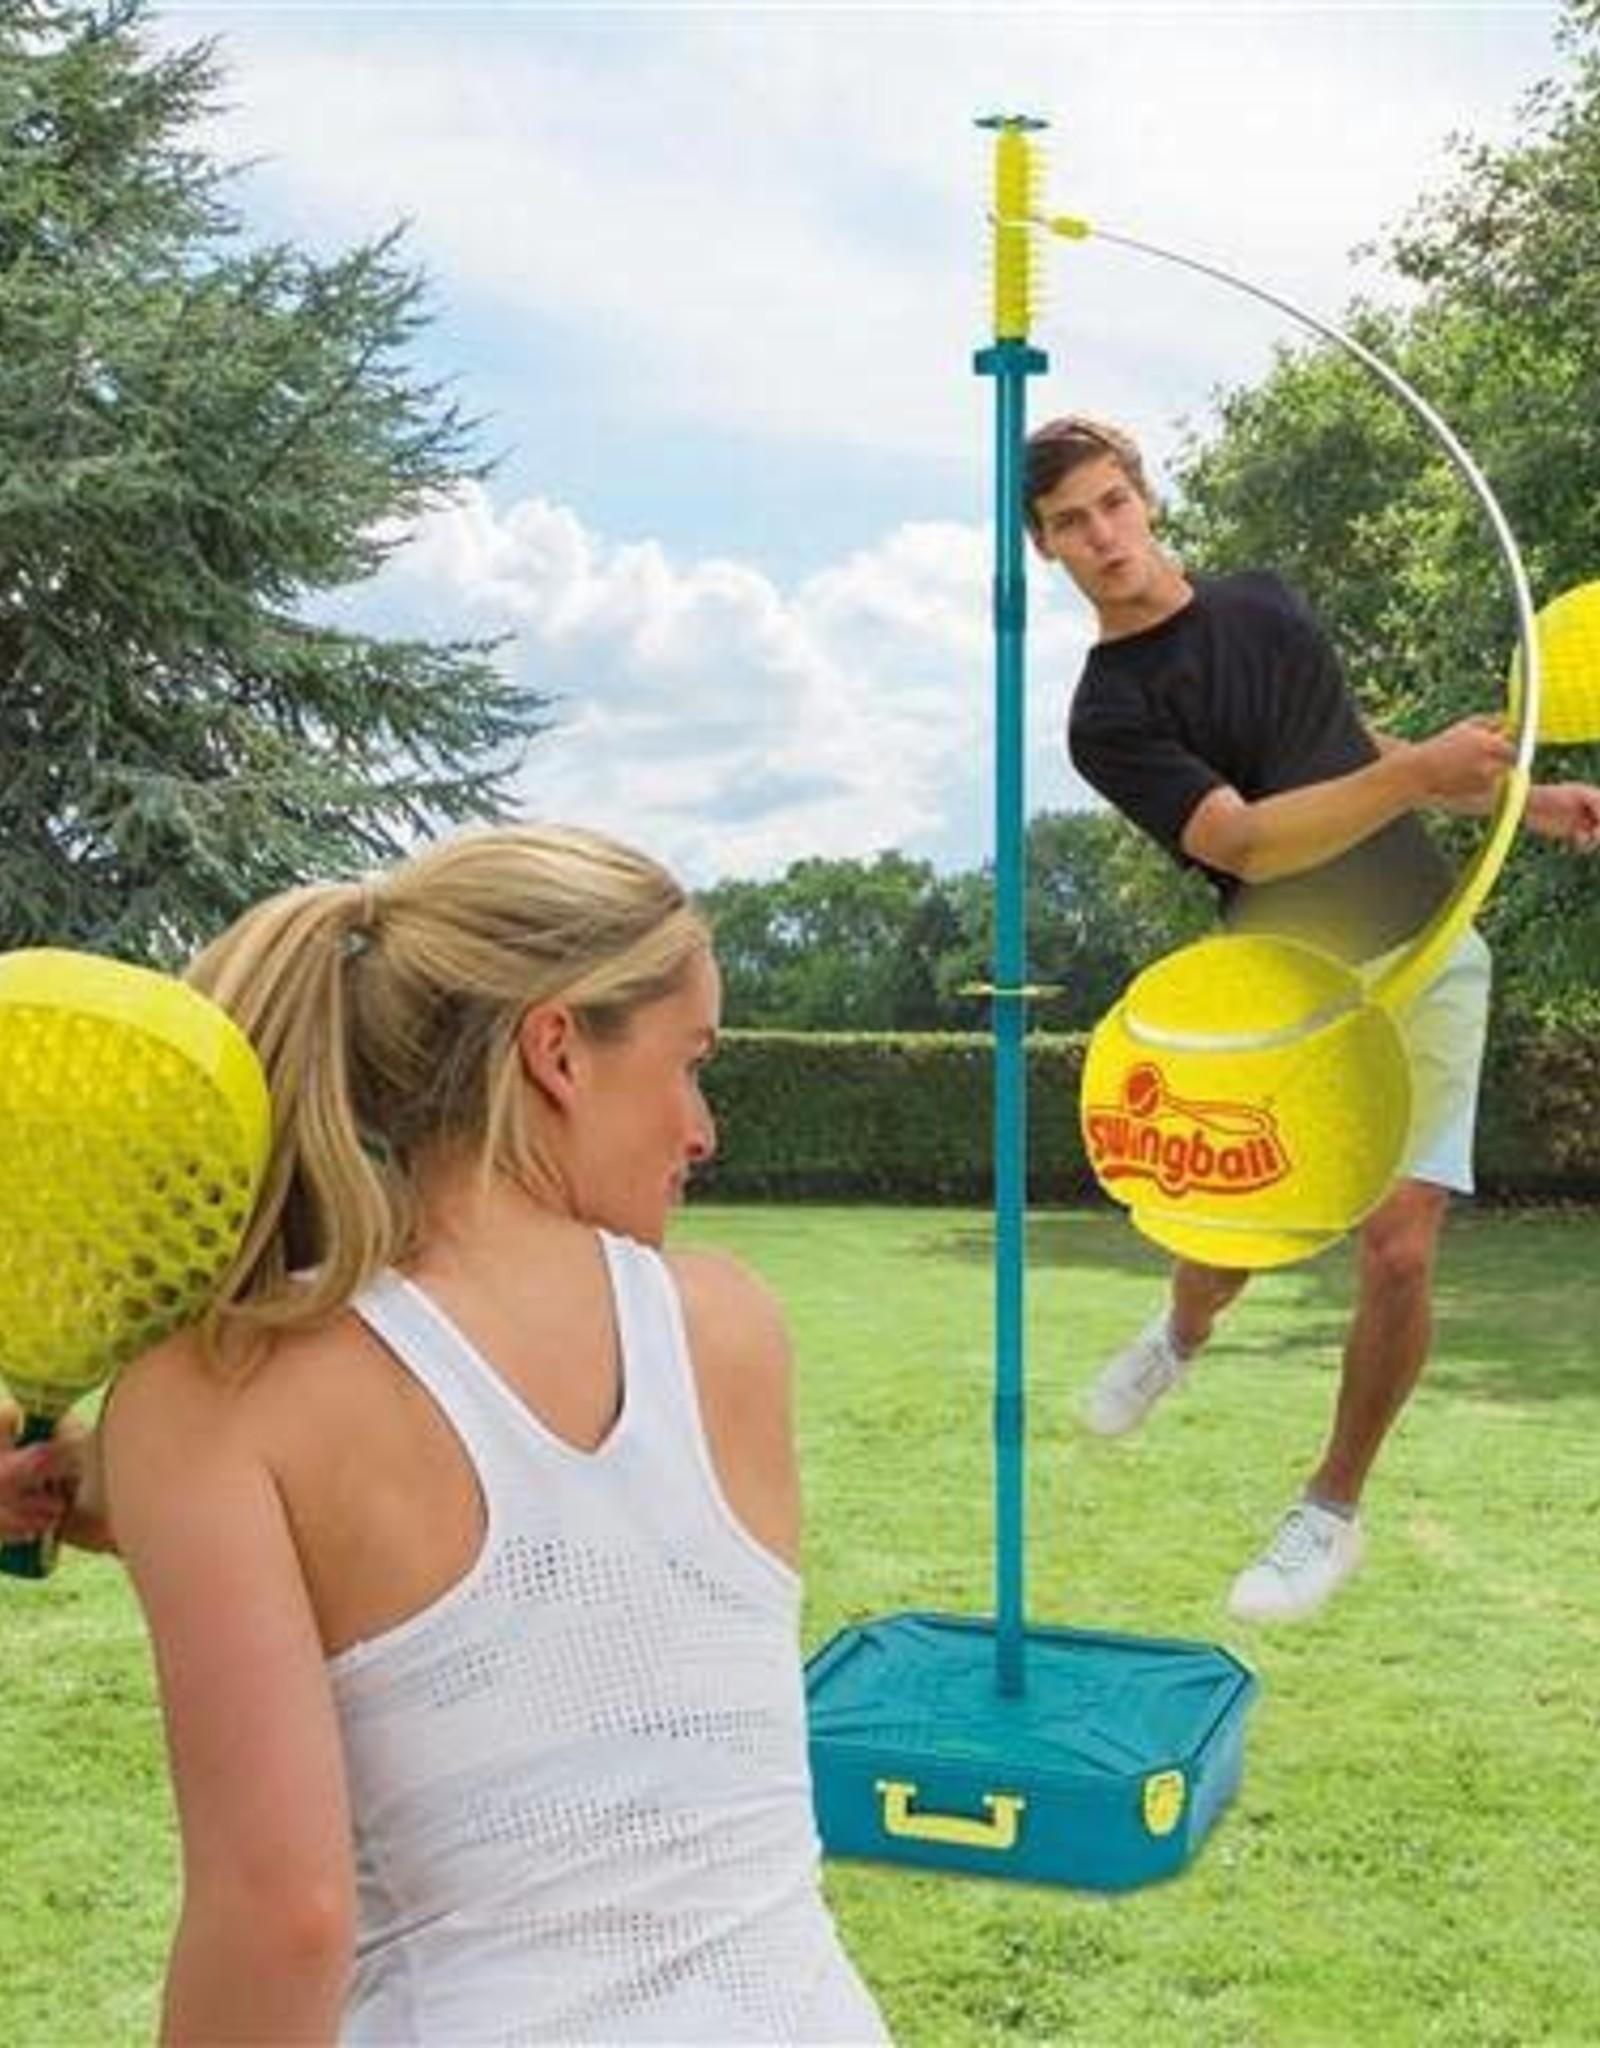 Swingball Pro